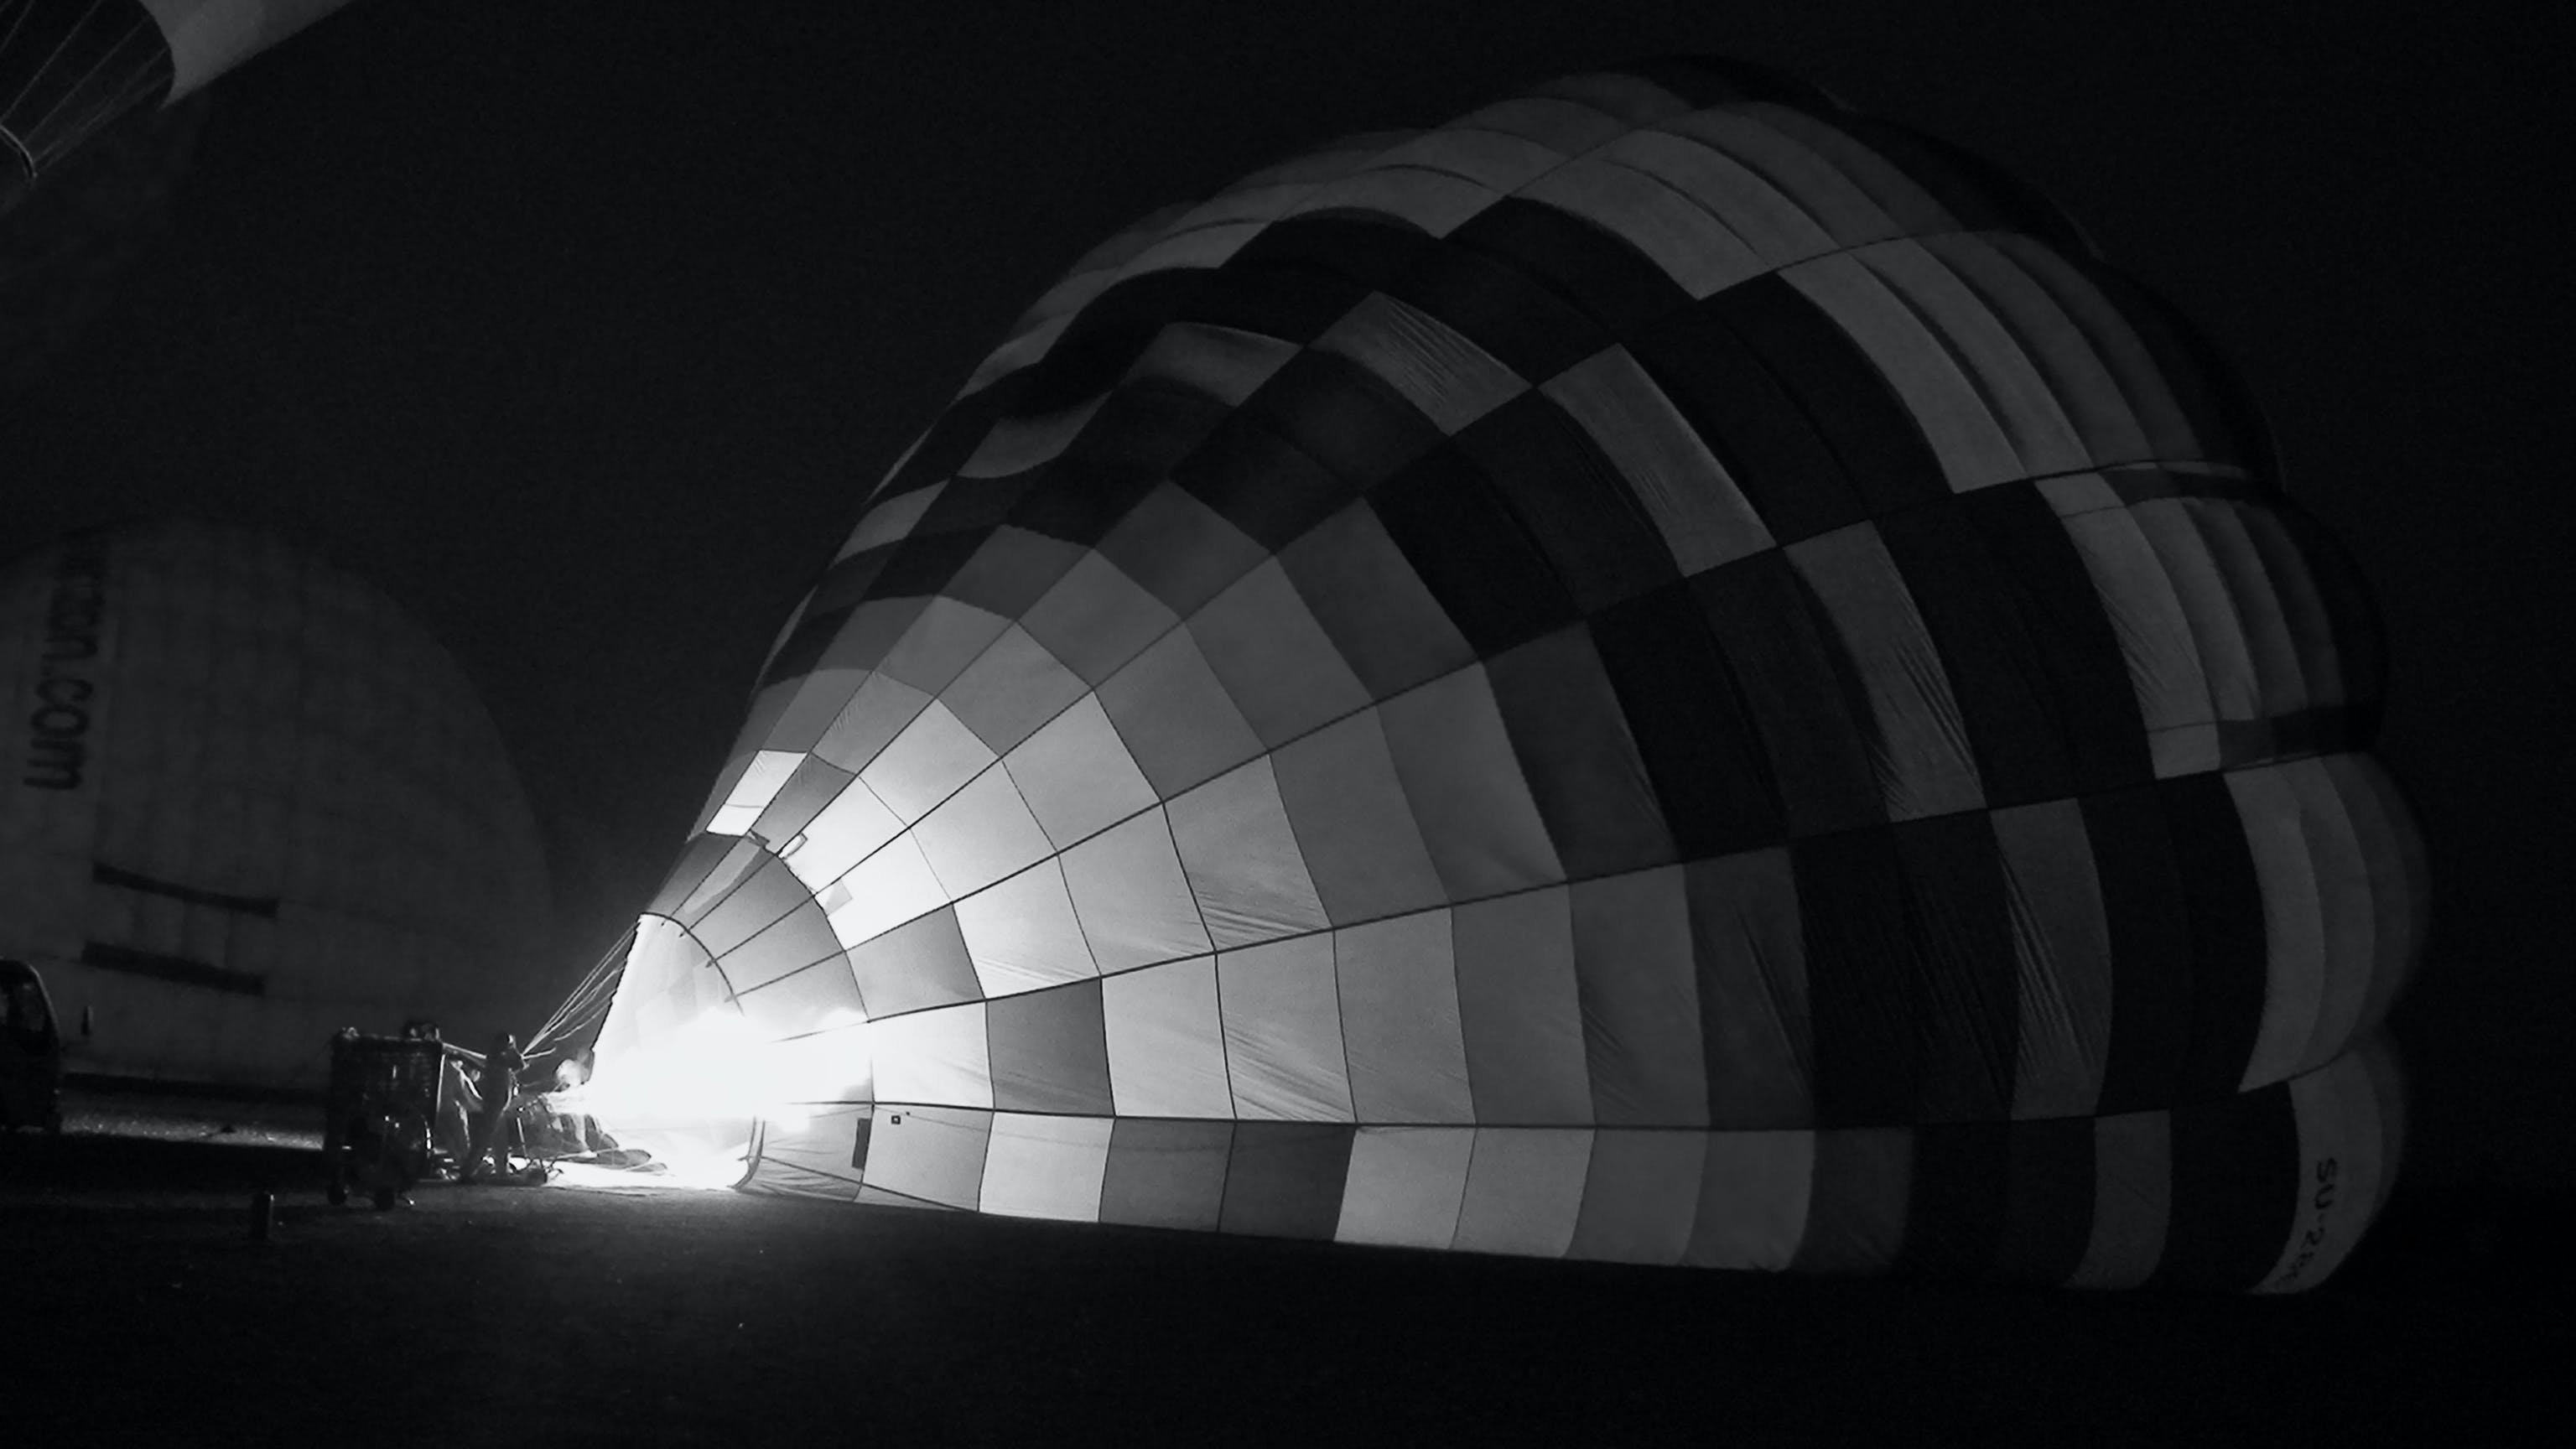 Free stock photo of hot air balloon